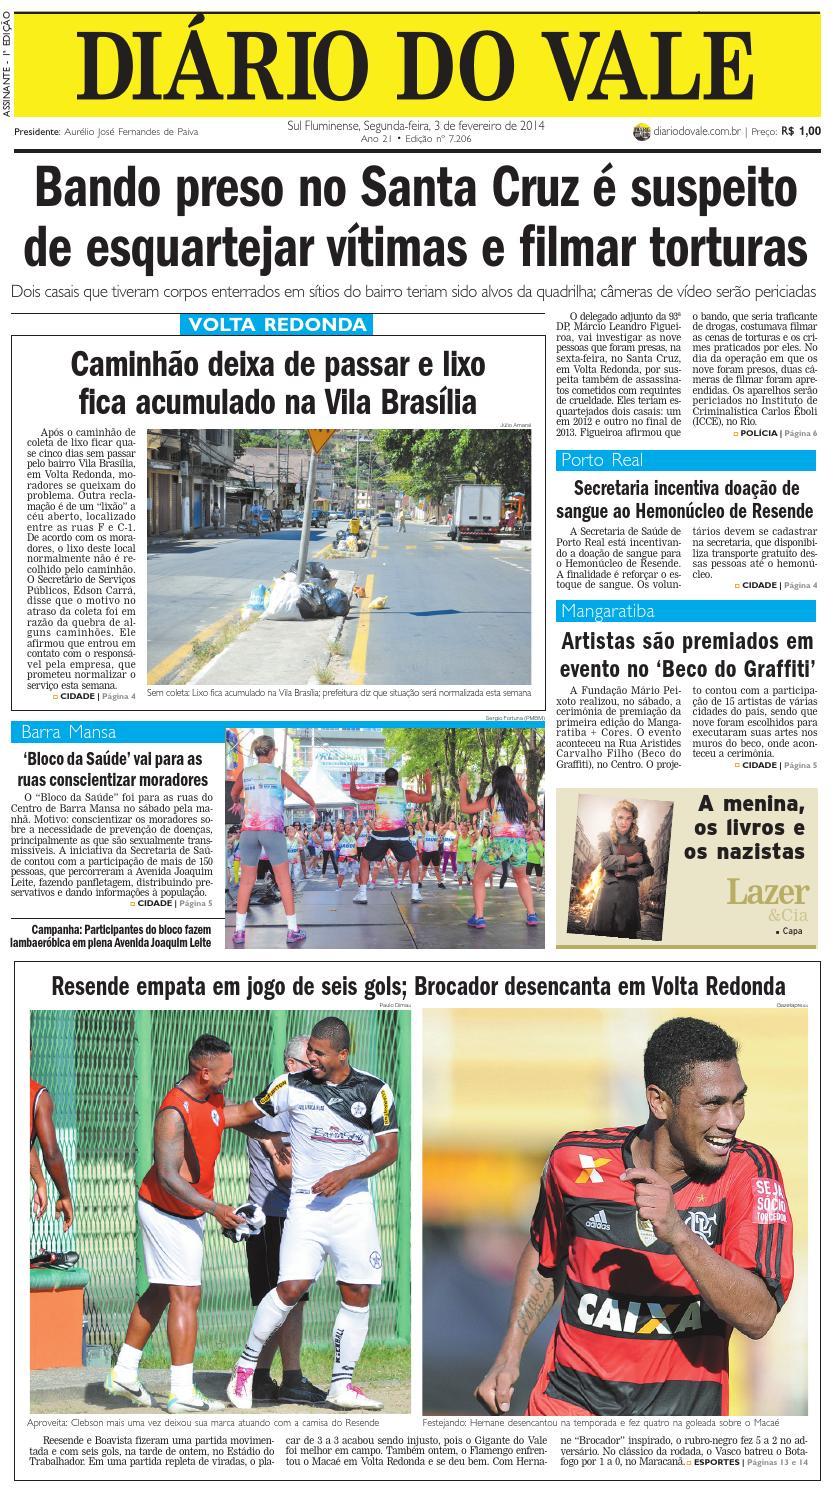 7206 diario segunda 03 02 2014 by Diário do Vale - issuu 7f3eb7b0c2c9c